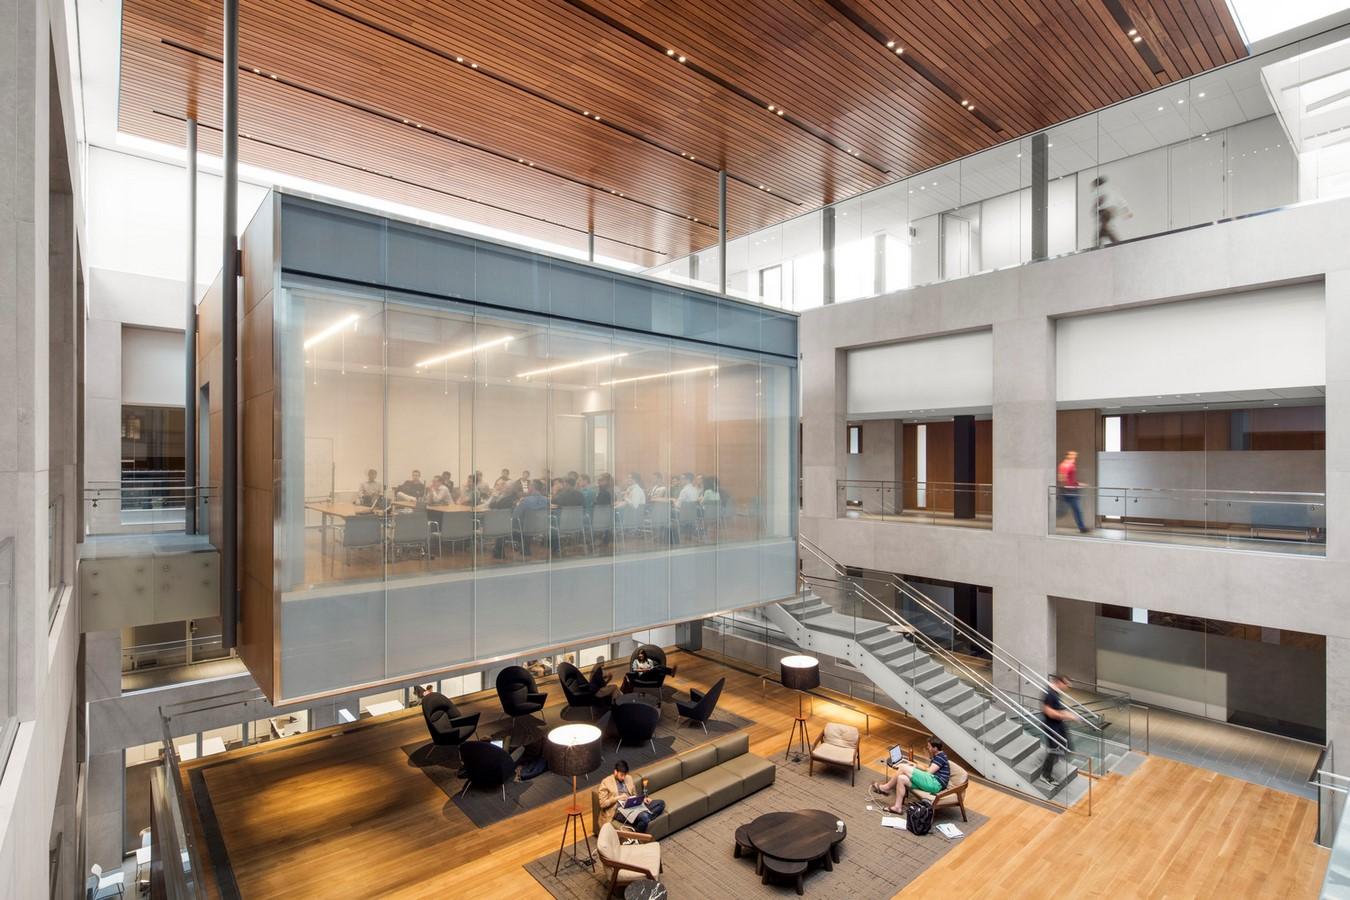 Julis Romo Rabinowitz Building & Louis A. Simpson International Building, Princeton University, New Jersey, United States - Sheet3